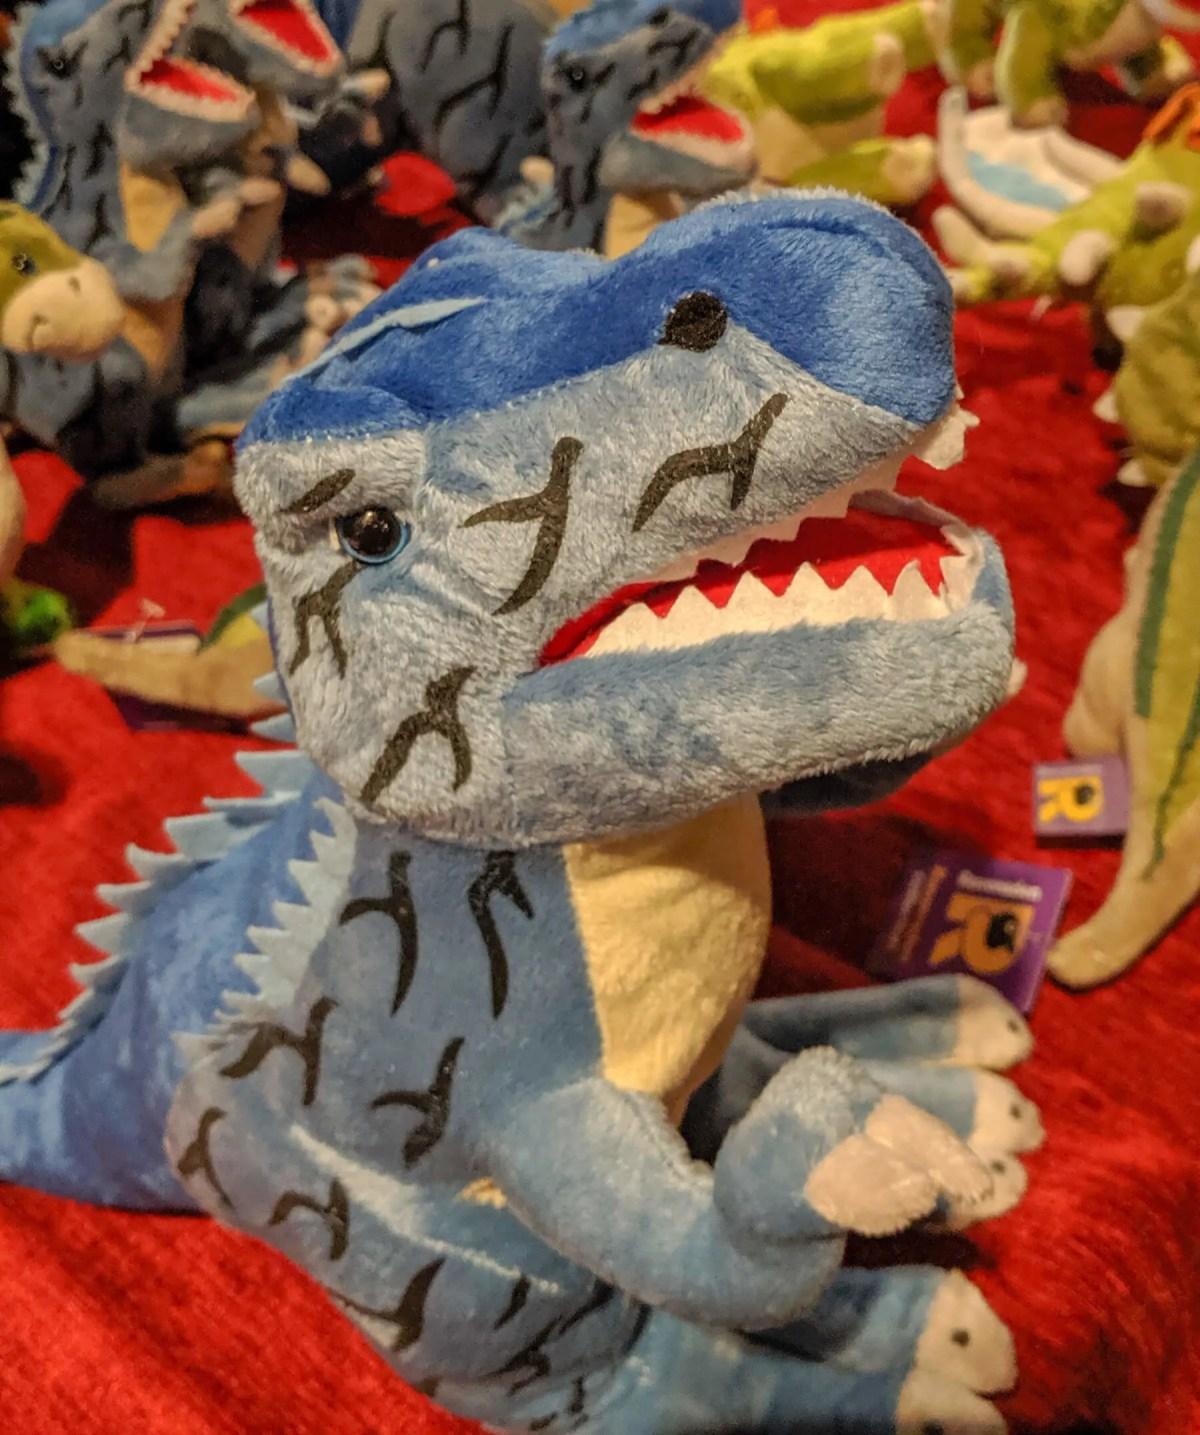 Cuddly dinosaur toy